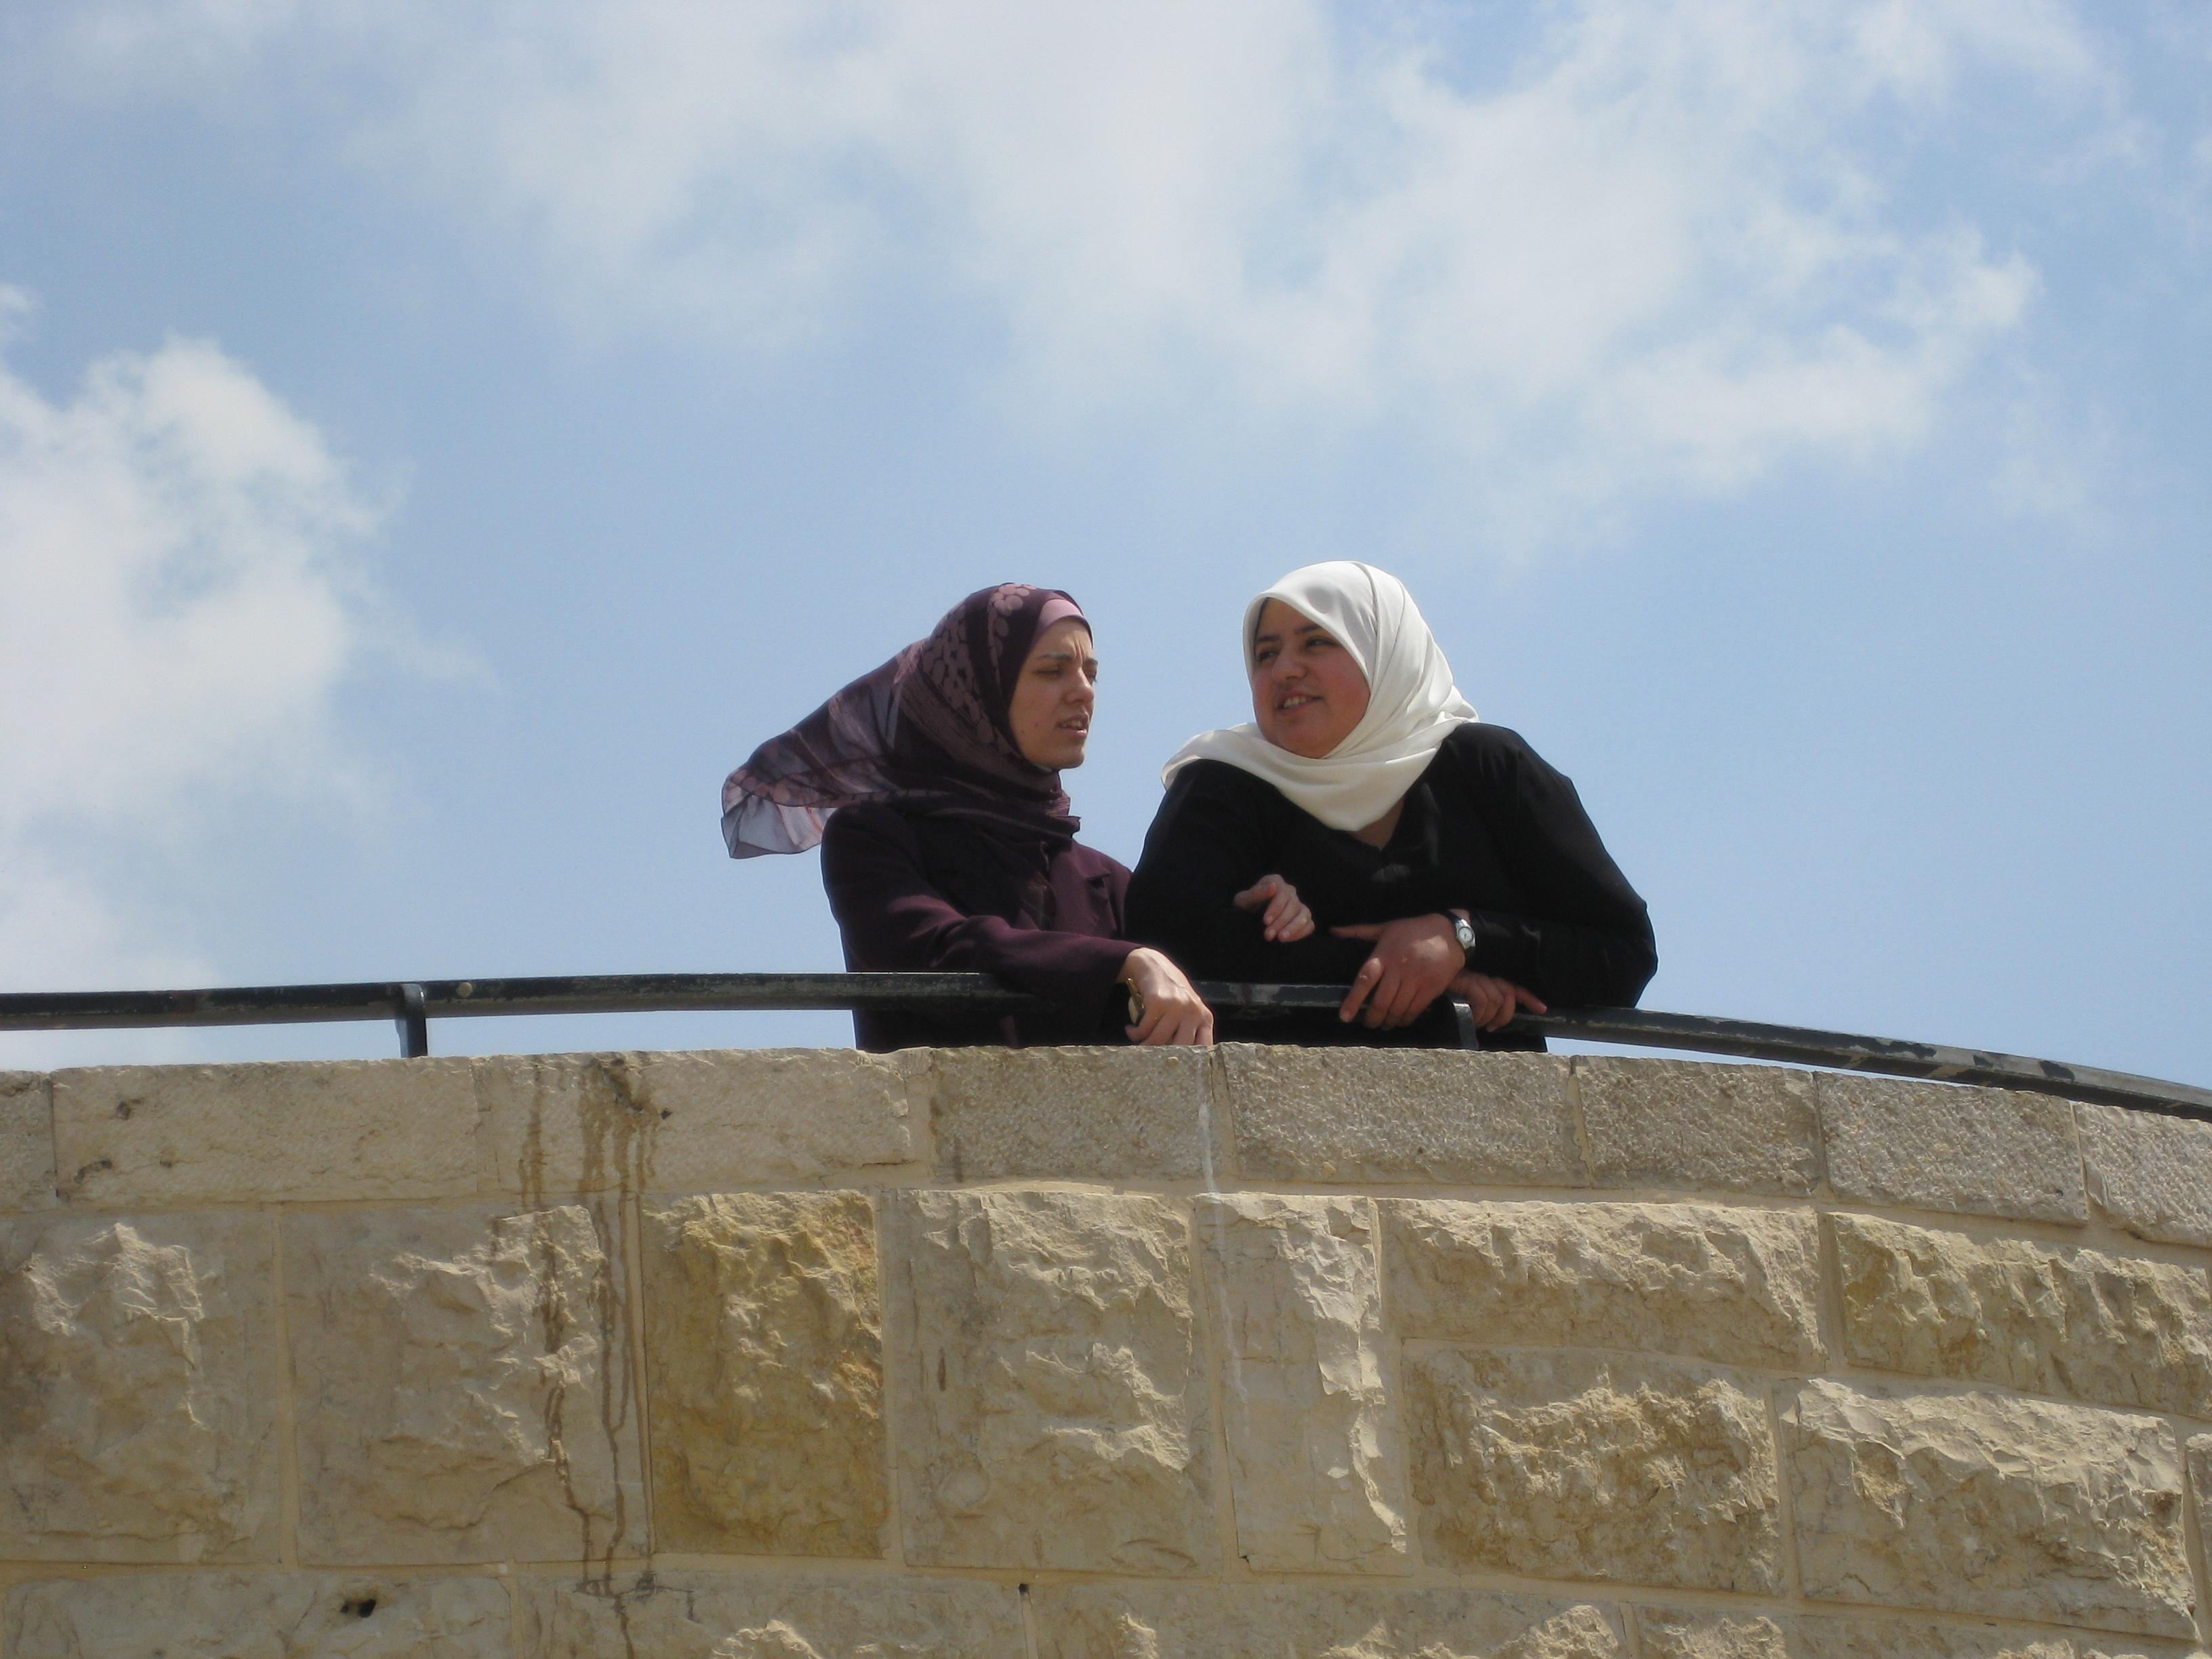 013_DECEMBER_Jerusalem_Marcy_Dory.JPG